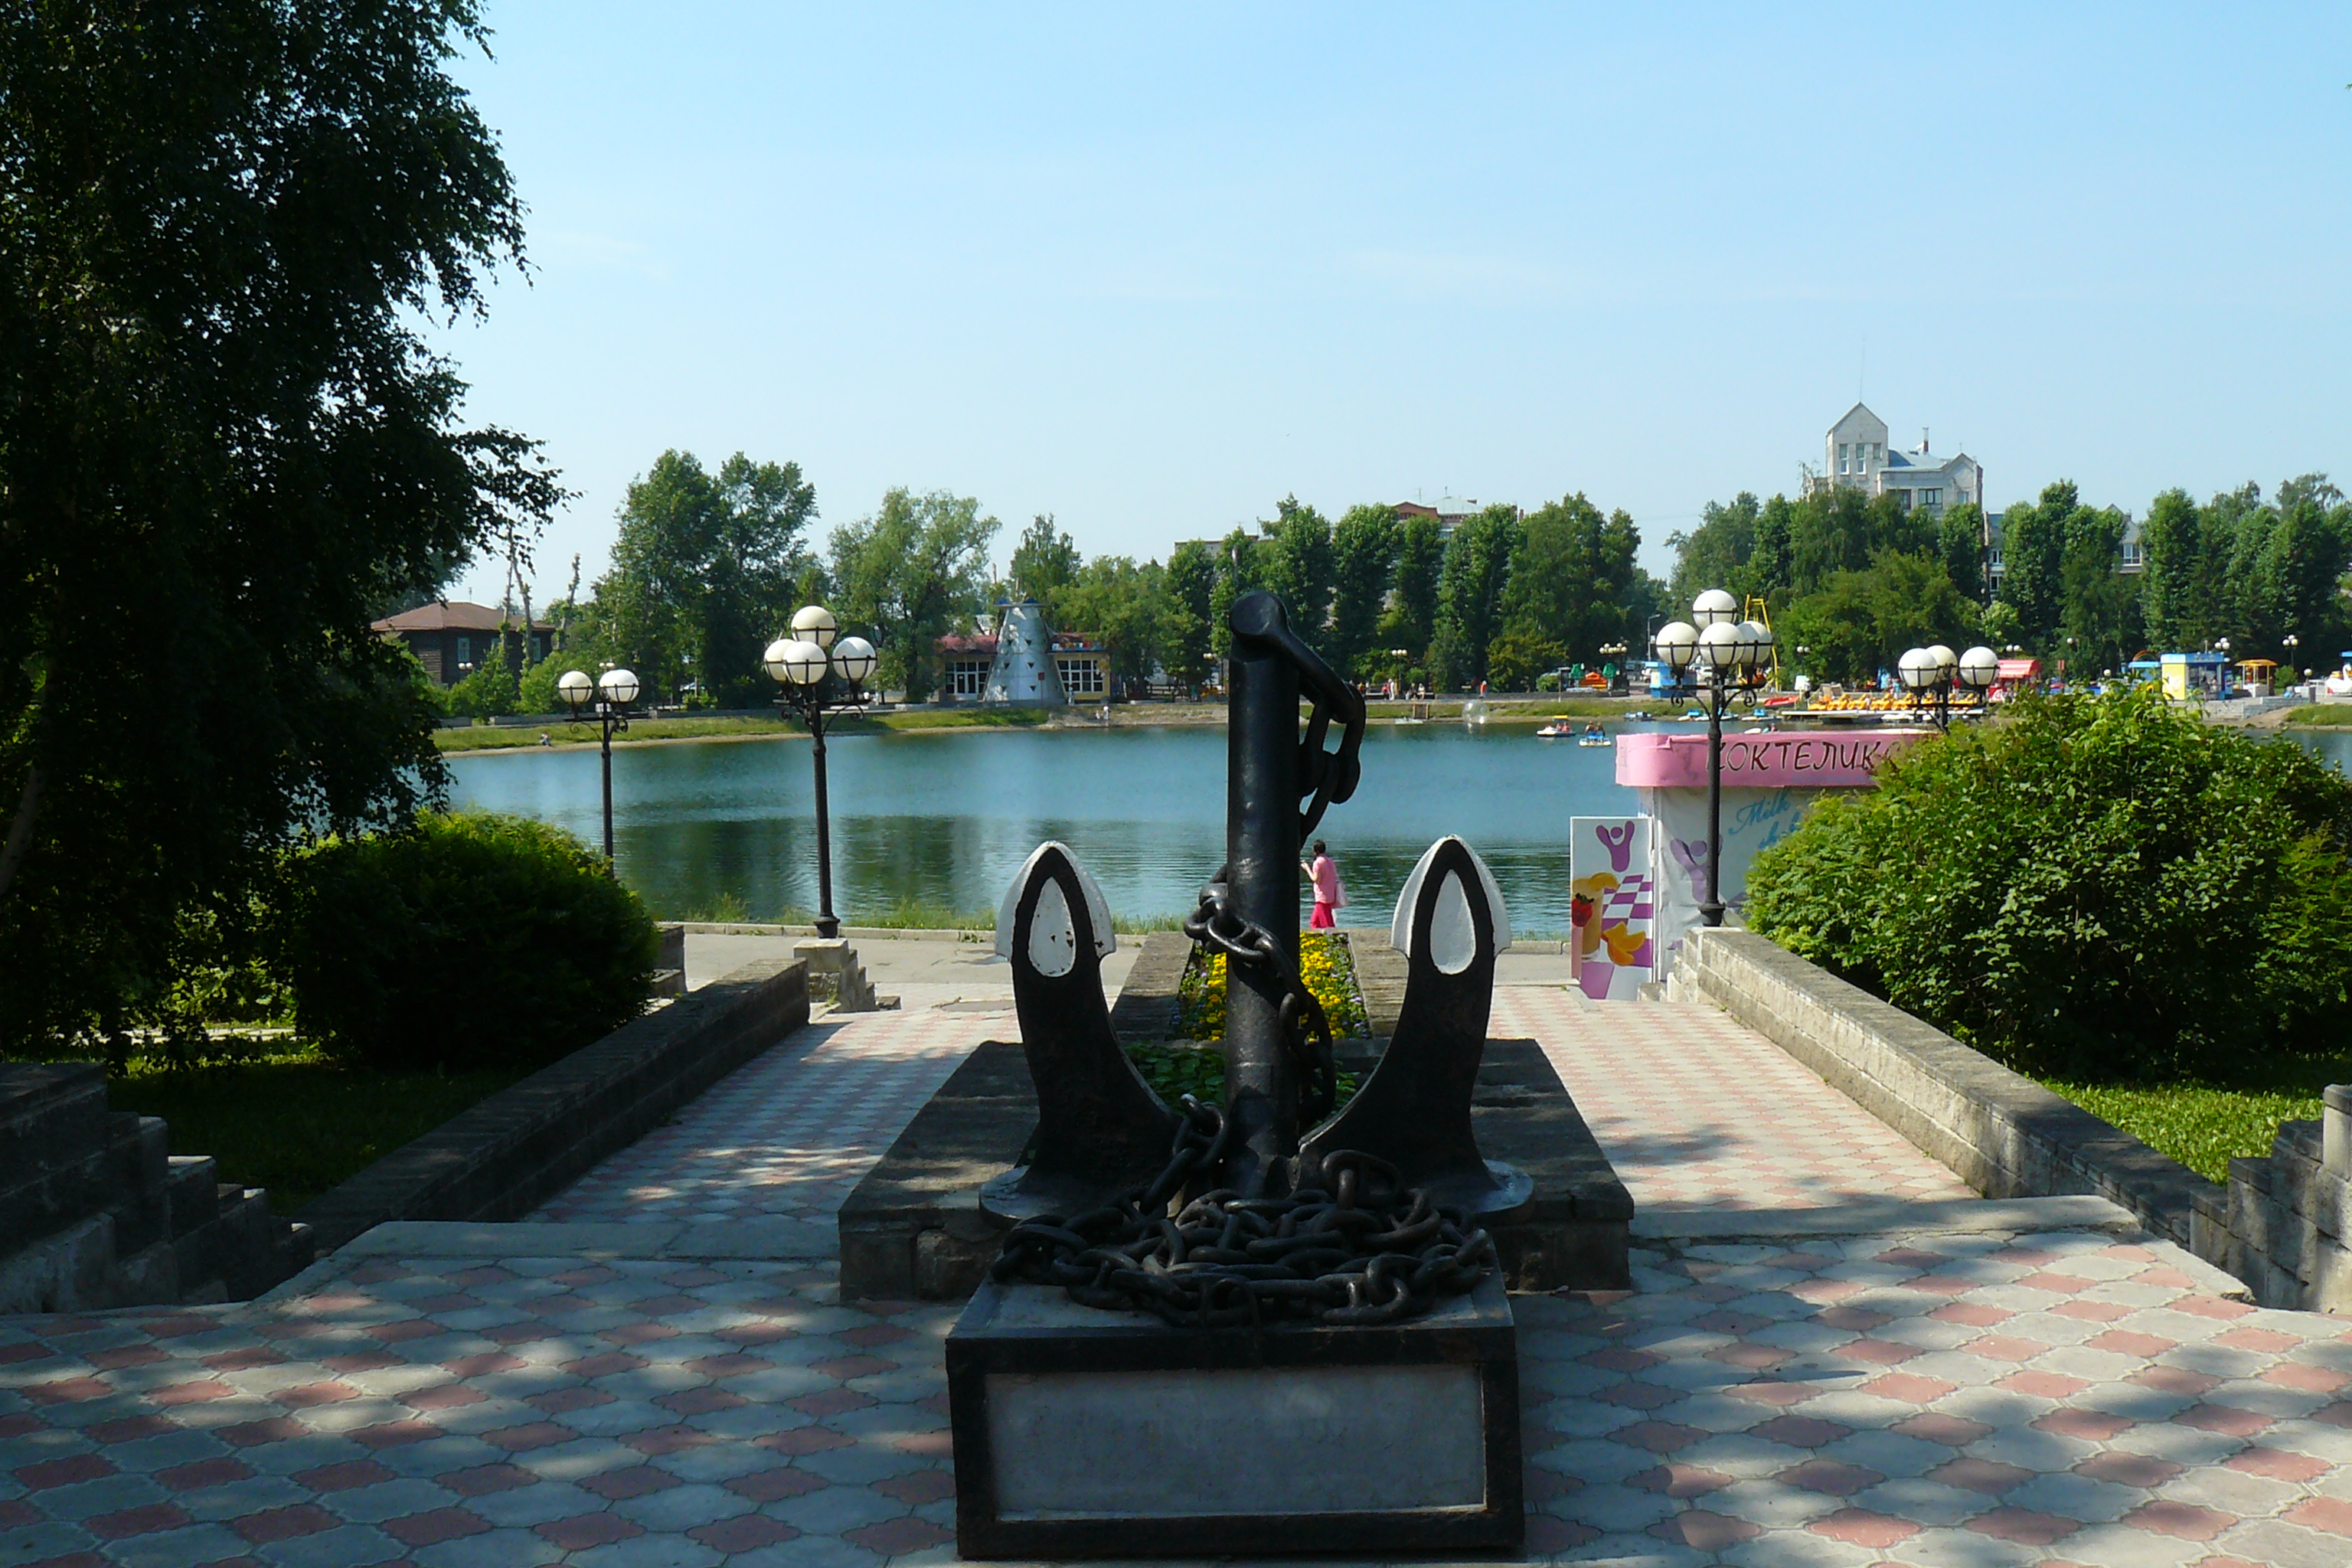 Озеро знакомств белое томск